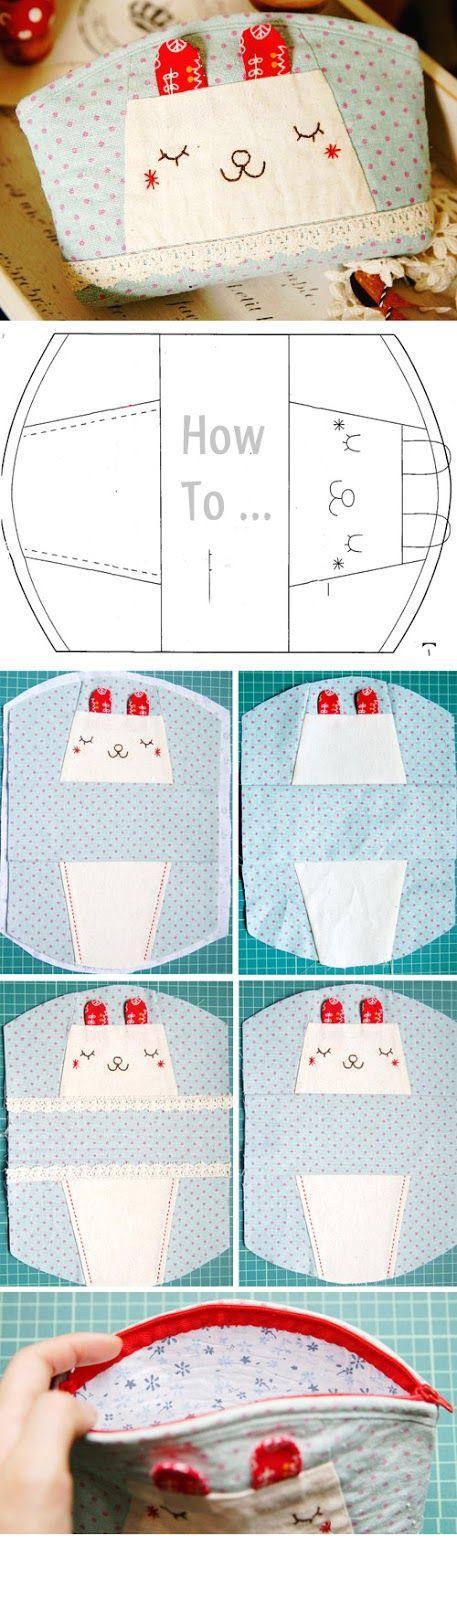 Pencil Case or Cosmetic Bag. How to sew. DIY Photo Tutorial  http://www.handmadiya.com/2016/02/honey-bunny-bags.html